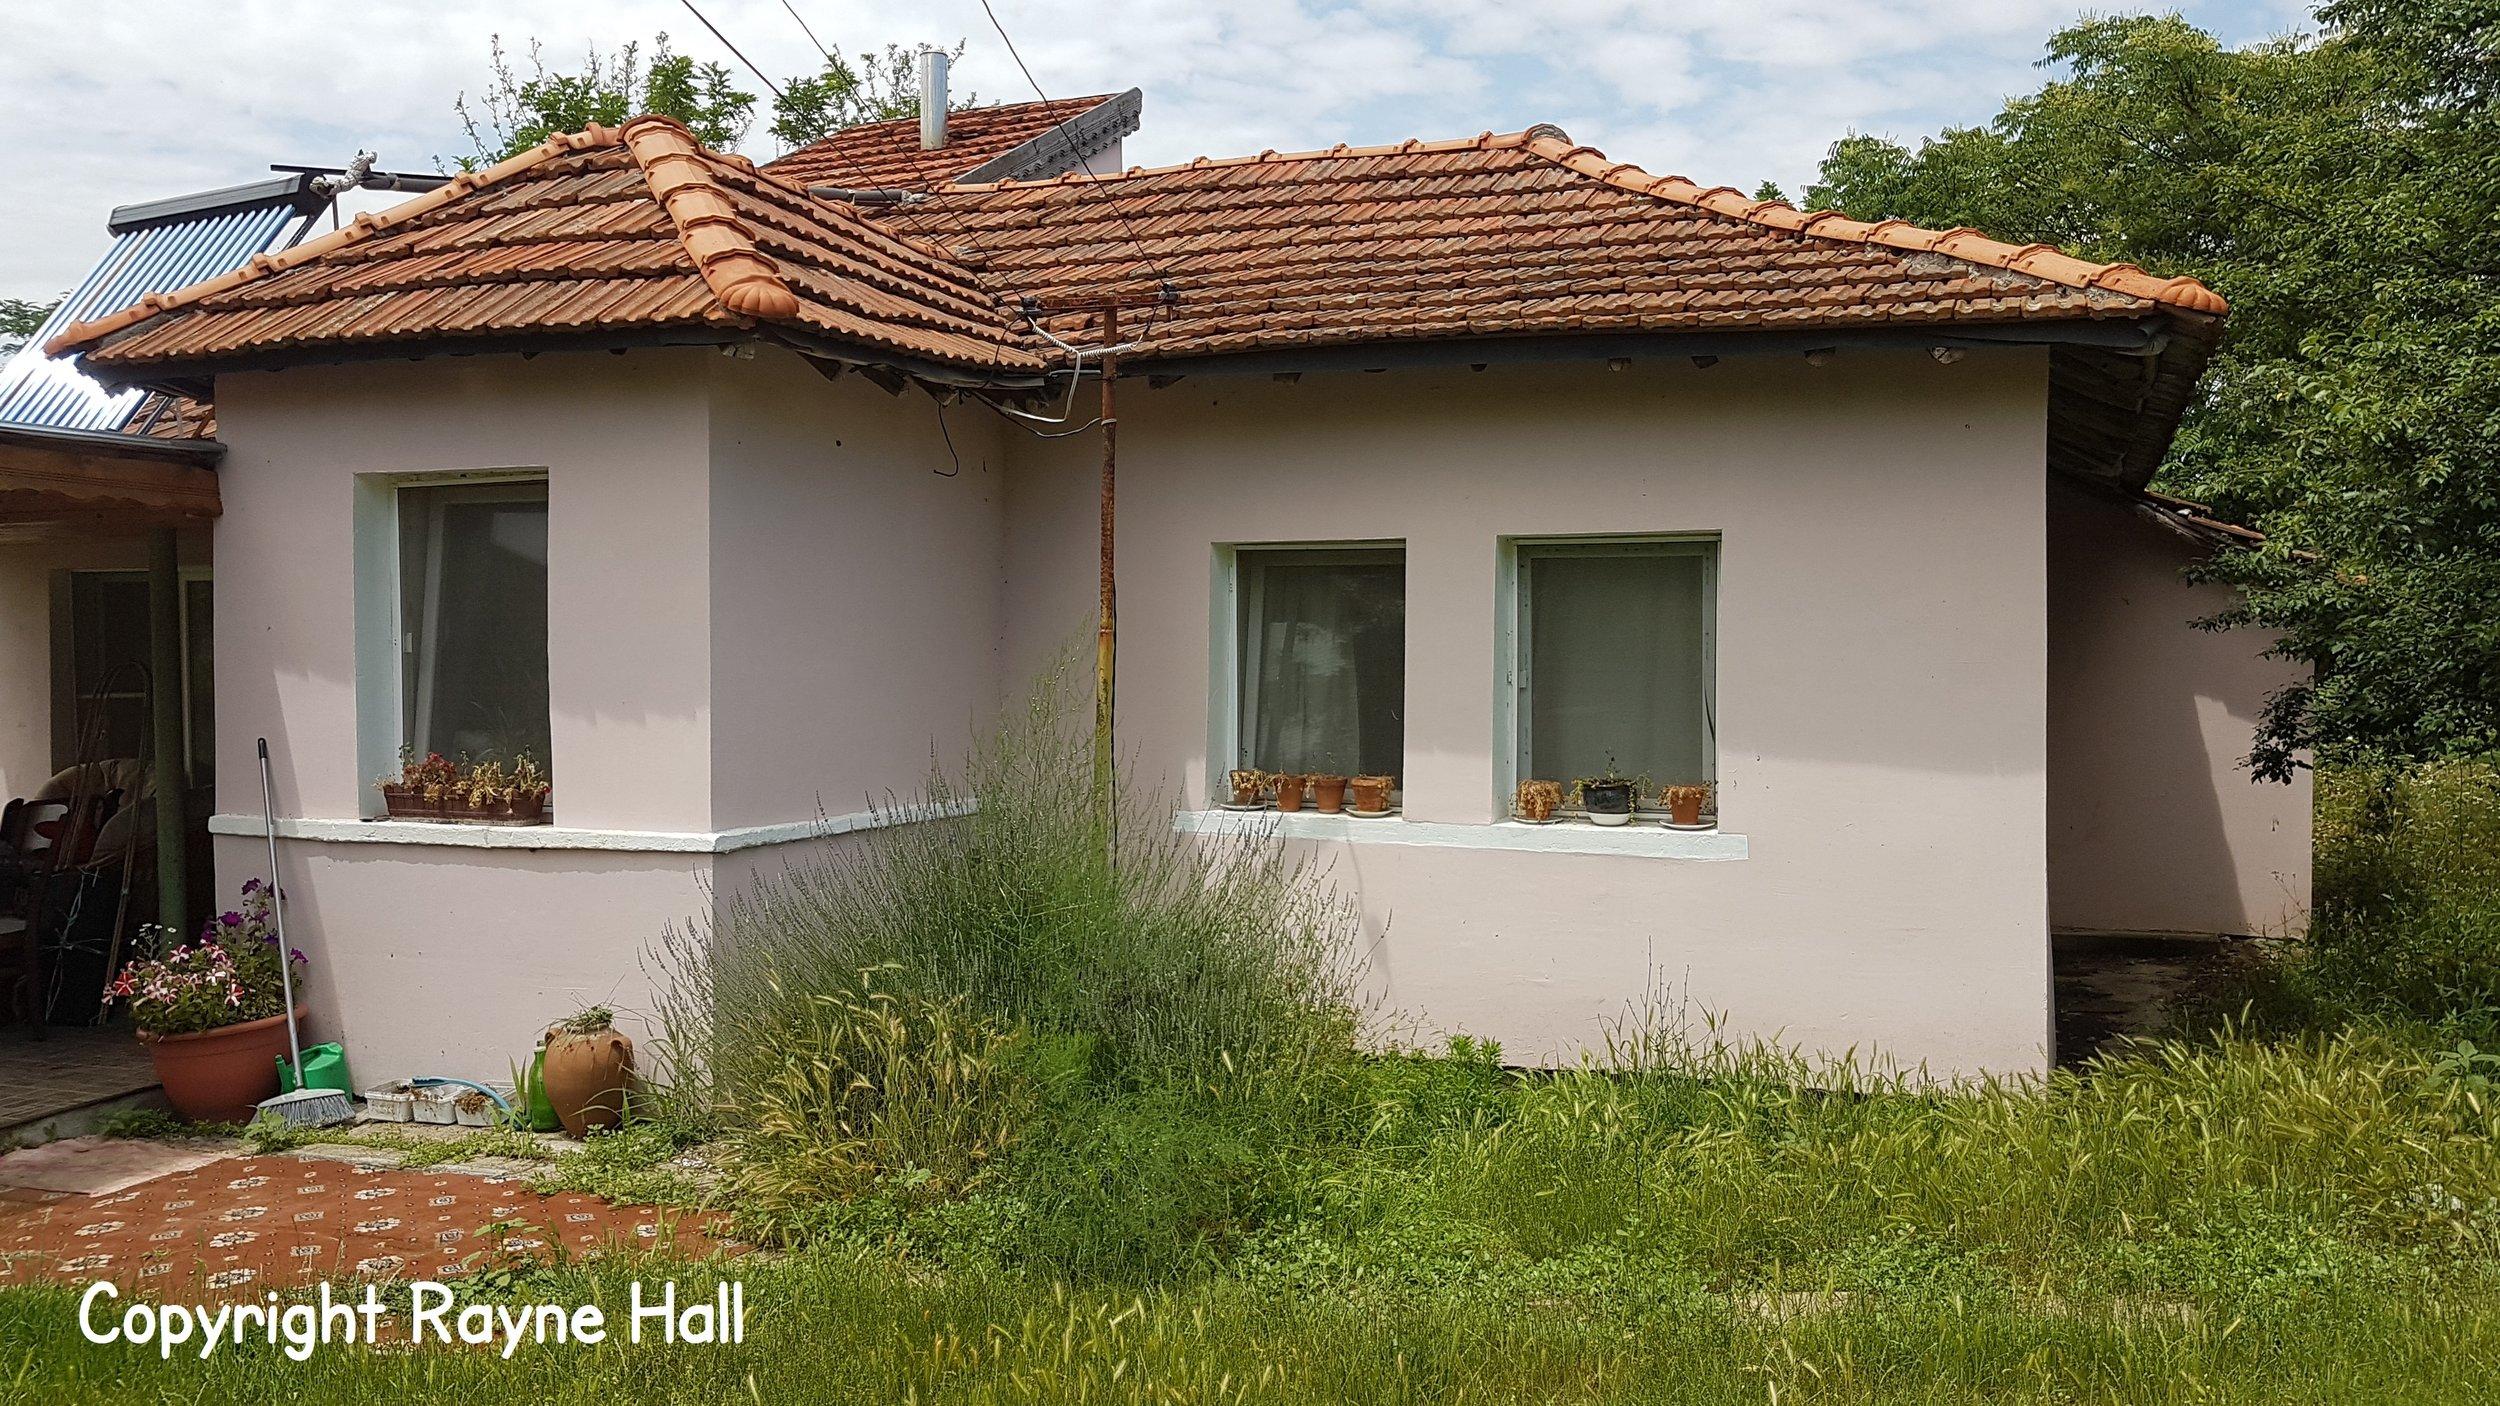 Rayne-Hall-Bulgaria-copyright (7).jpg